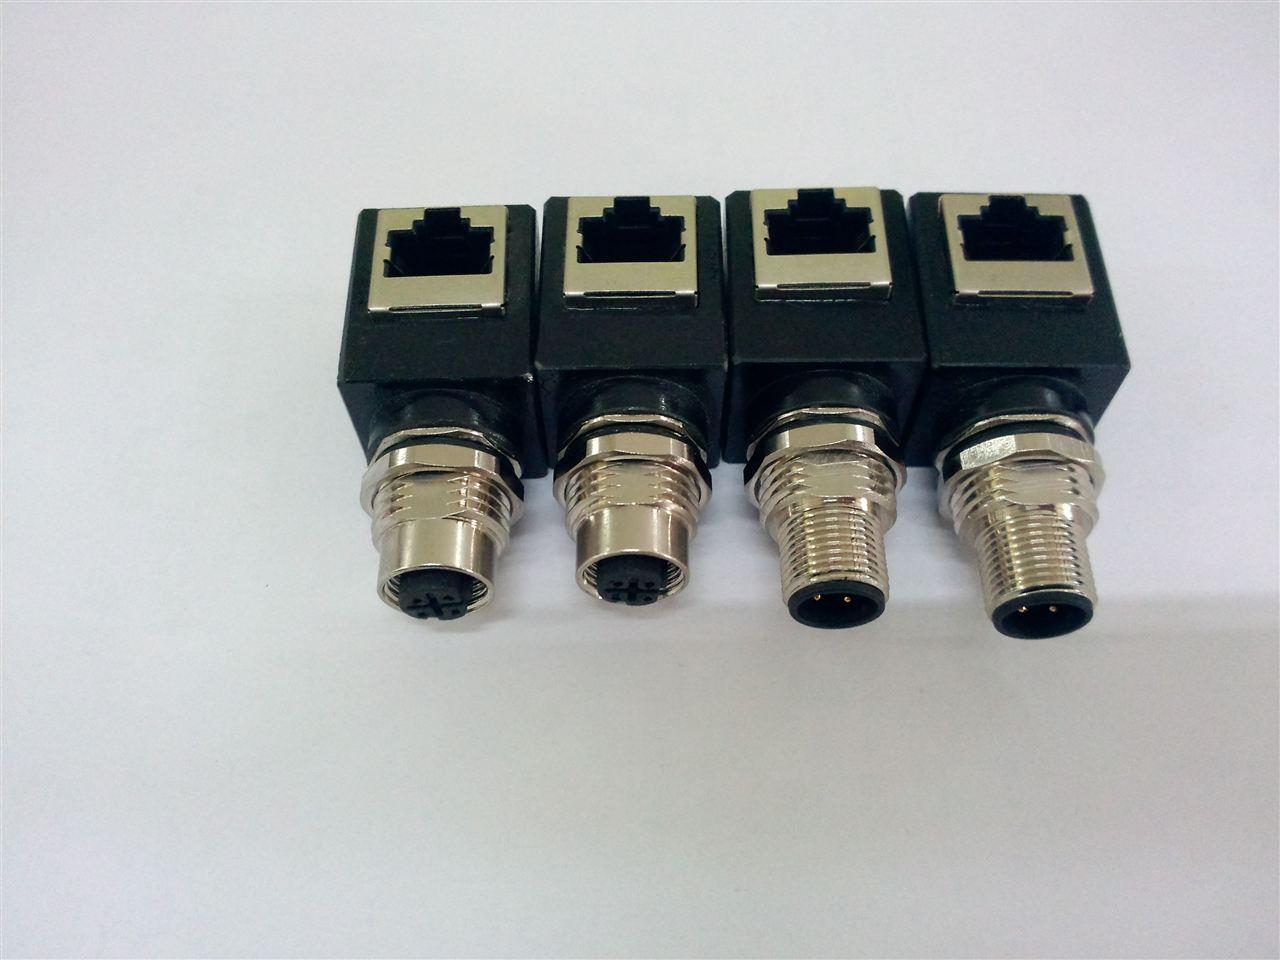 RJ45 —M12工业以太网交换机连接器完全按照针脚定义自制的工业以太网通讯线,用万用表测量两头导通没问题,结果用到现场死活通讯不上,TP灯慢速闪烁,这是为什么呢?是交换机端口功率不够么?很显然不是,这次连直接用PC上的端口都扫描不到现场的以太网设备!已经入夜很久,客户坚称网线是没问题的,难道就这么通宵耗下去?